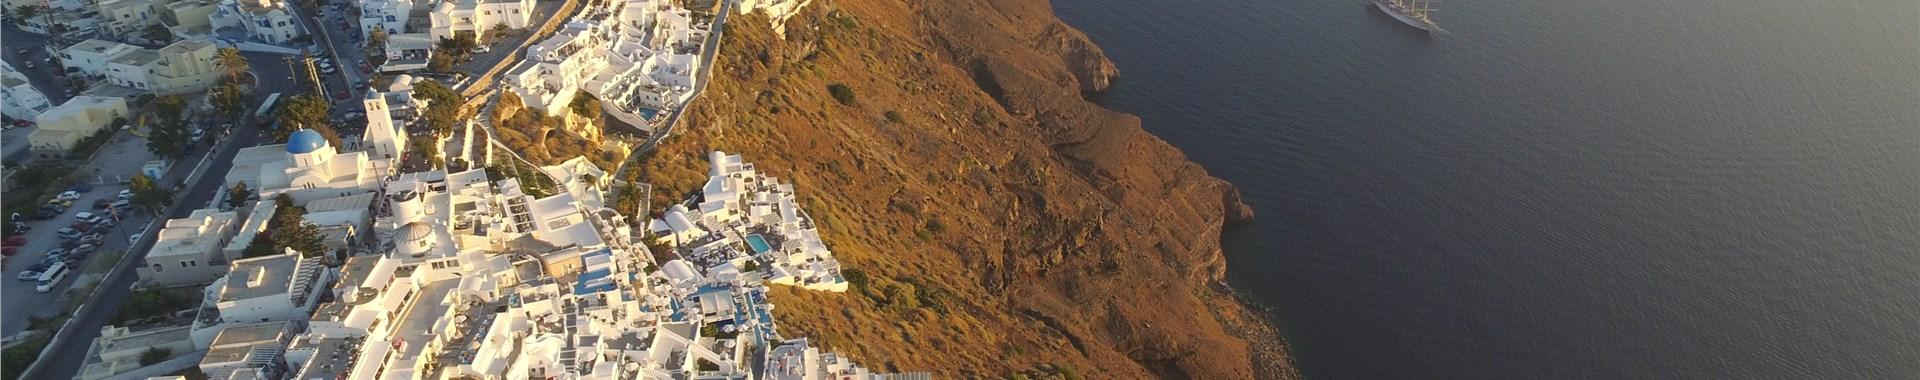 Firostefani Firostefani Hotels in Santorini island, Greece